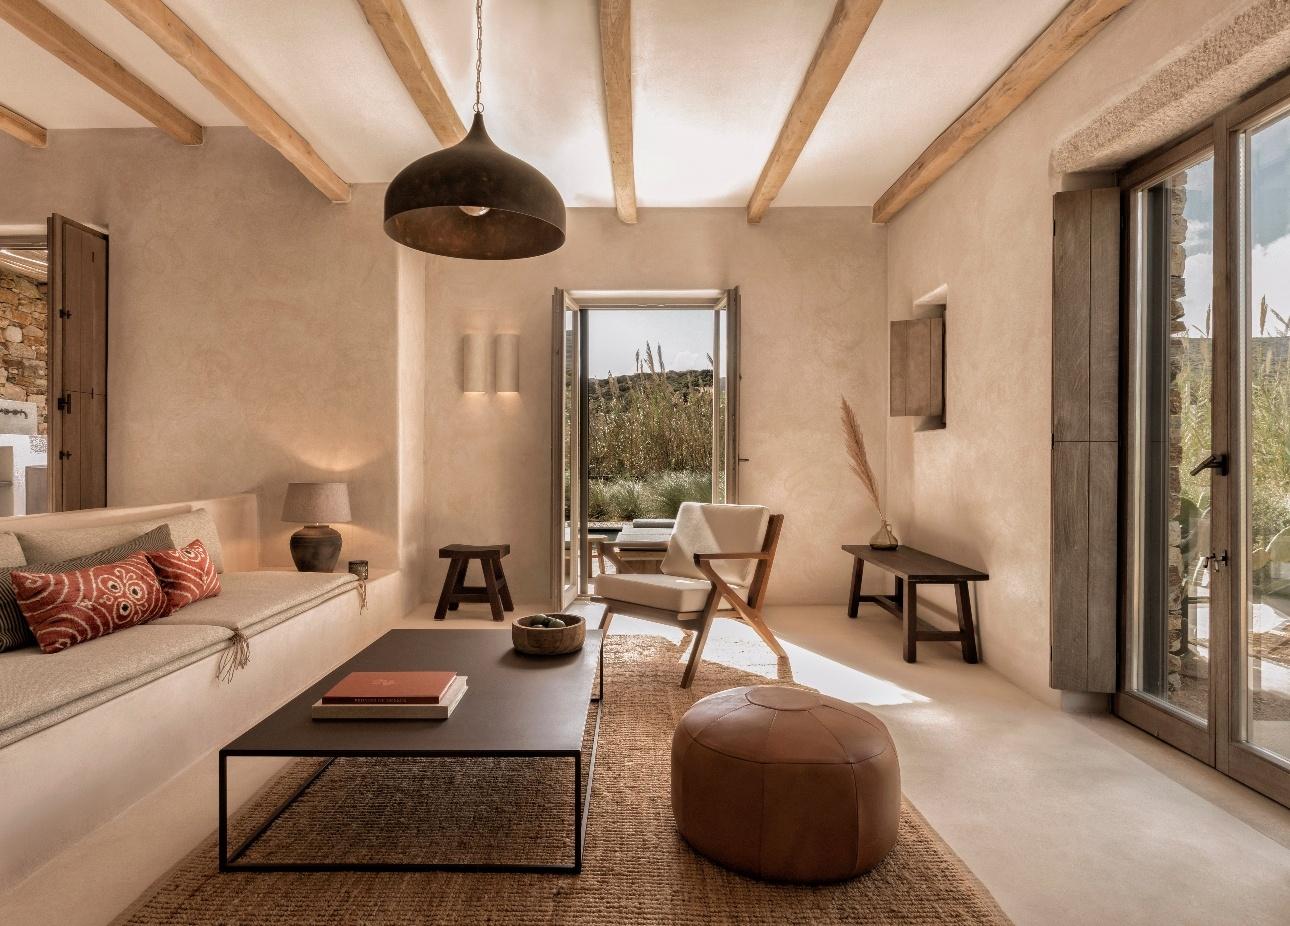 interior of suite simplistic style neutral decor